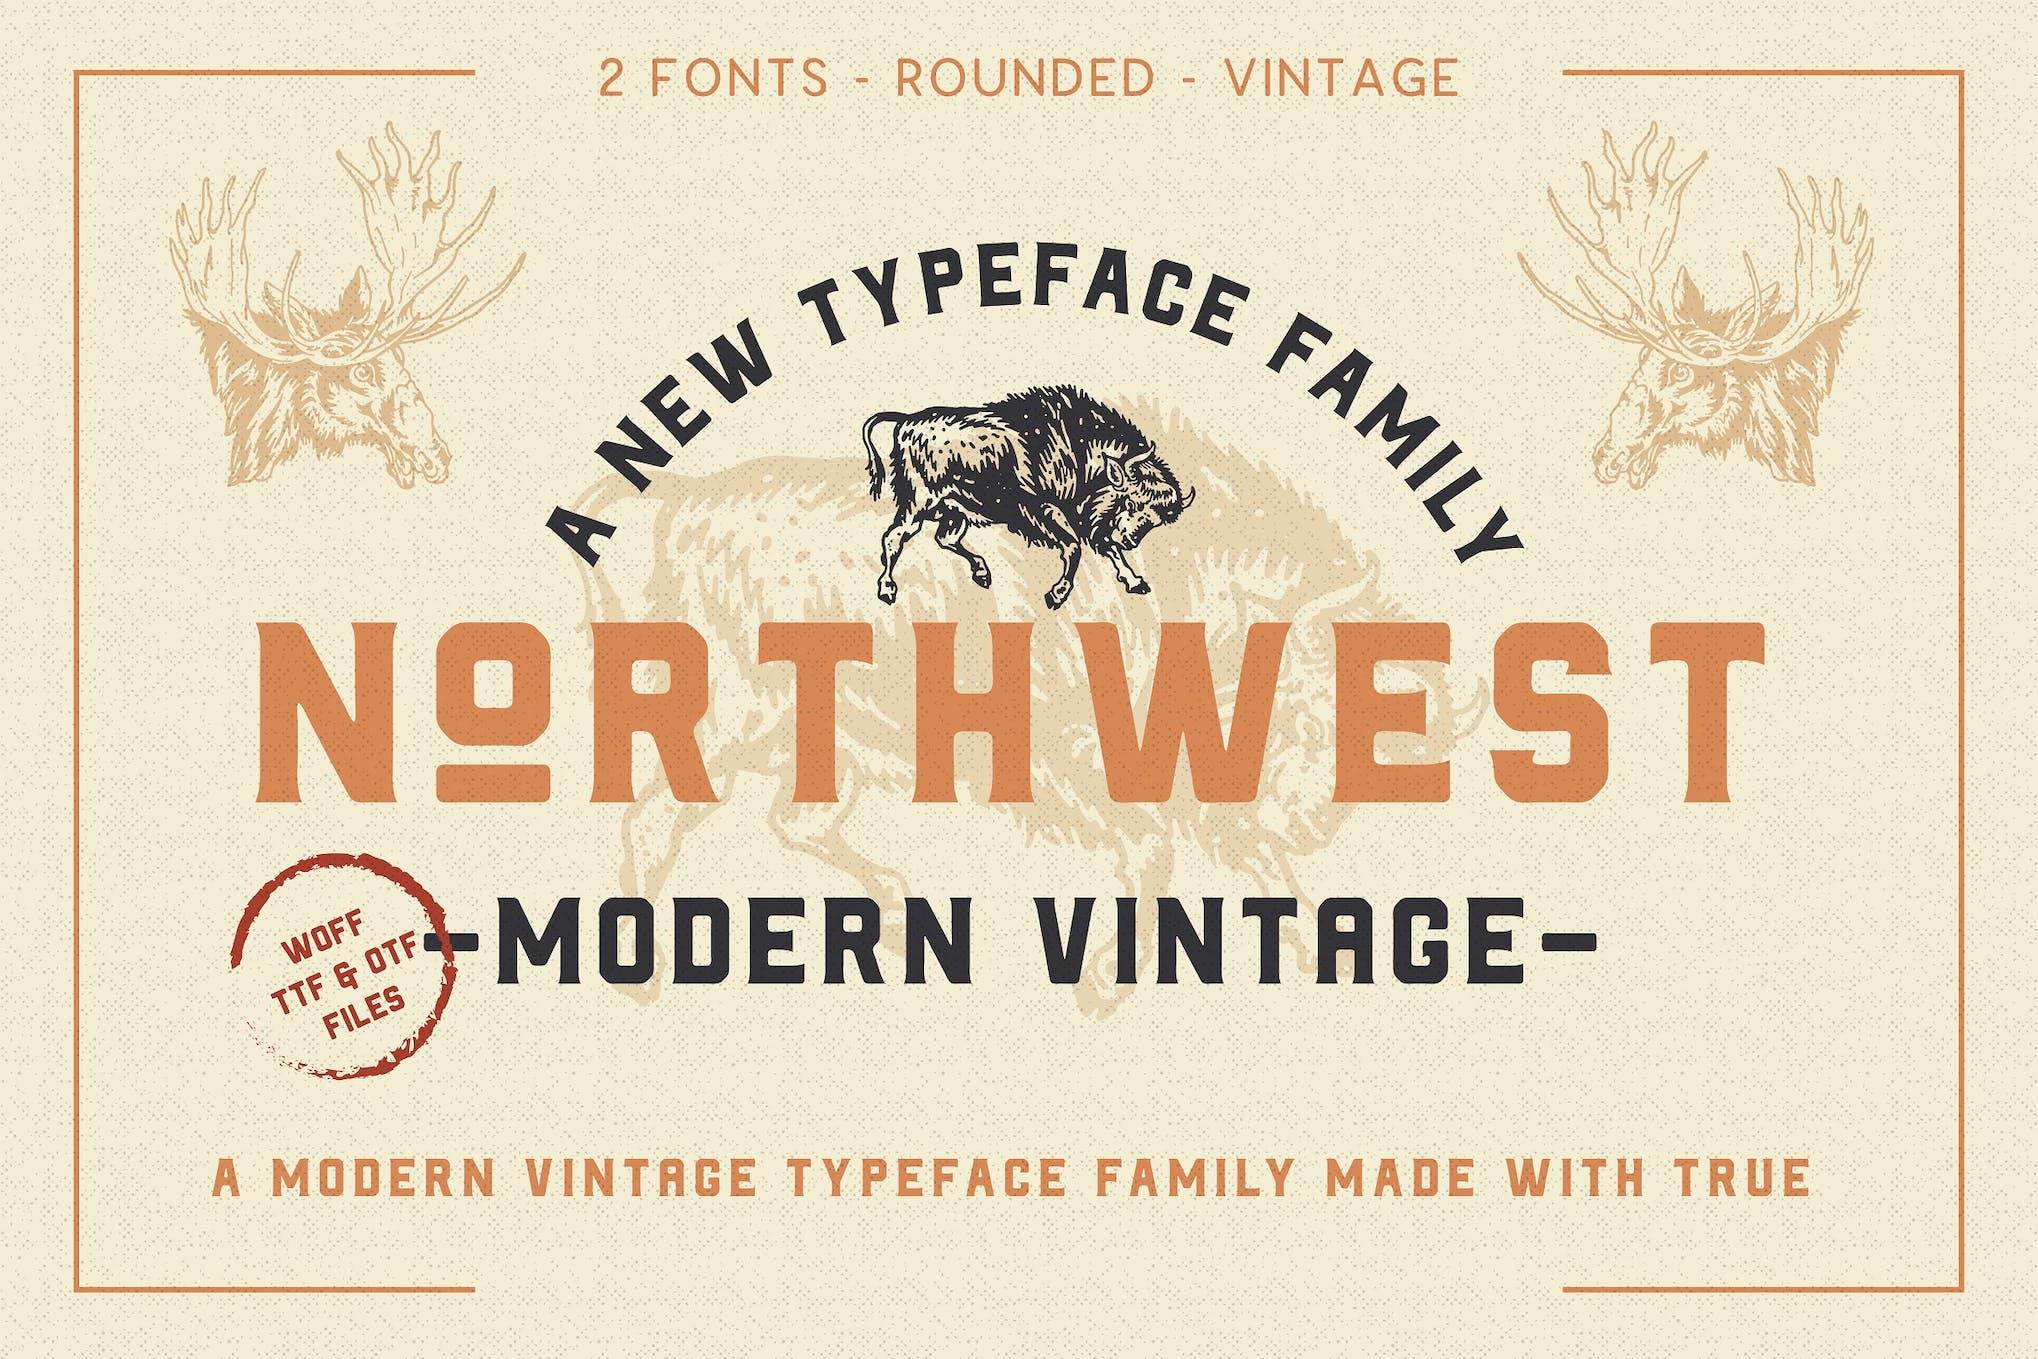 Brewski - Brewery Typeface by NEWFLIX on Envato Elements